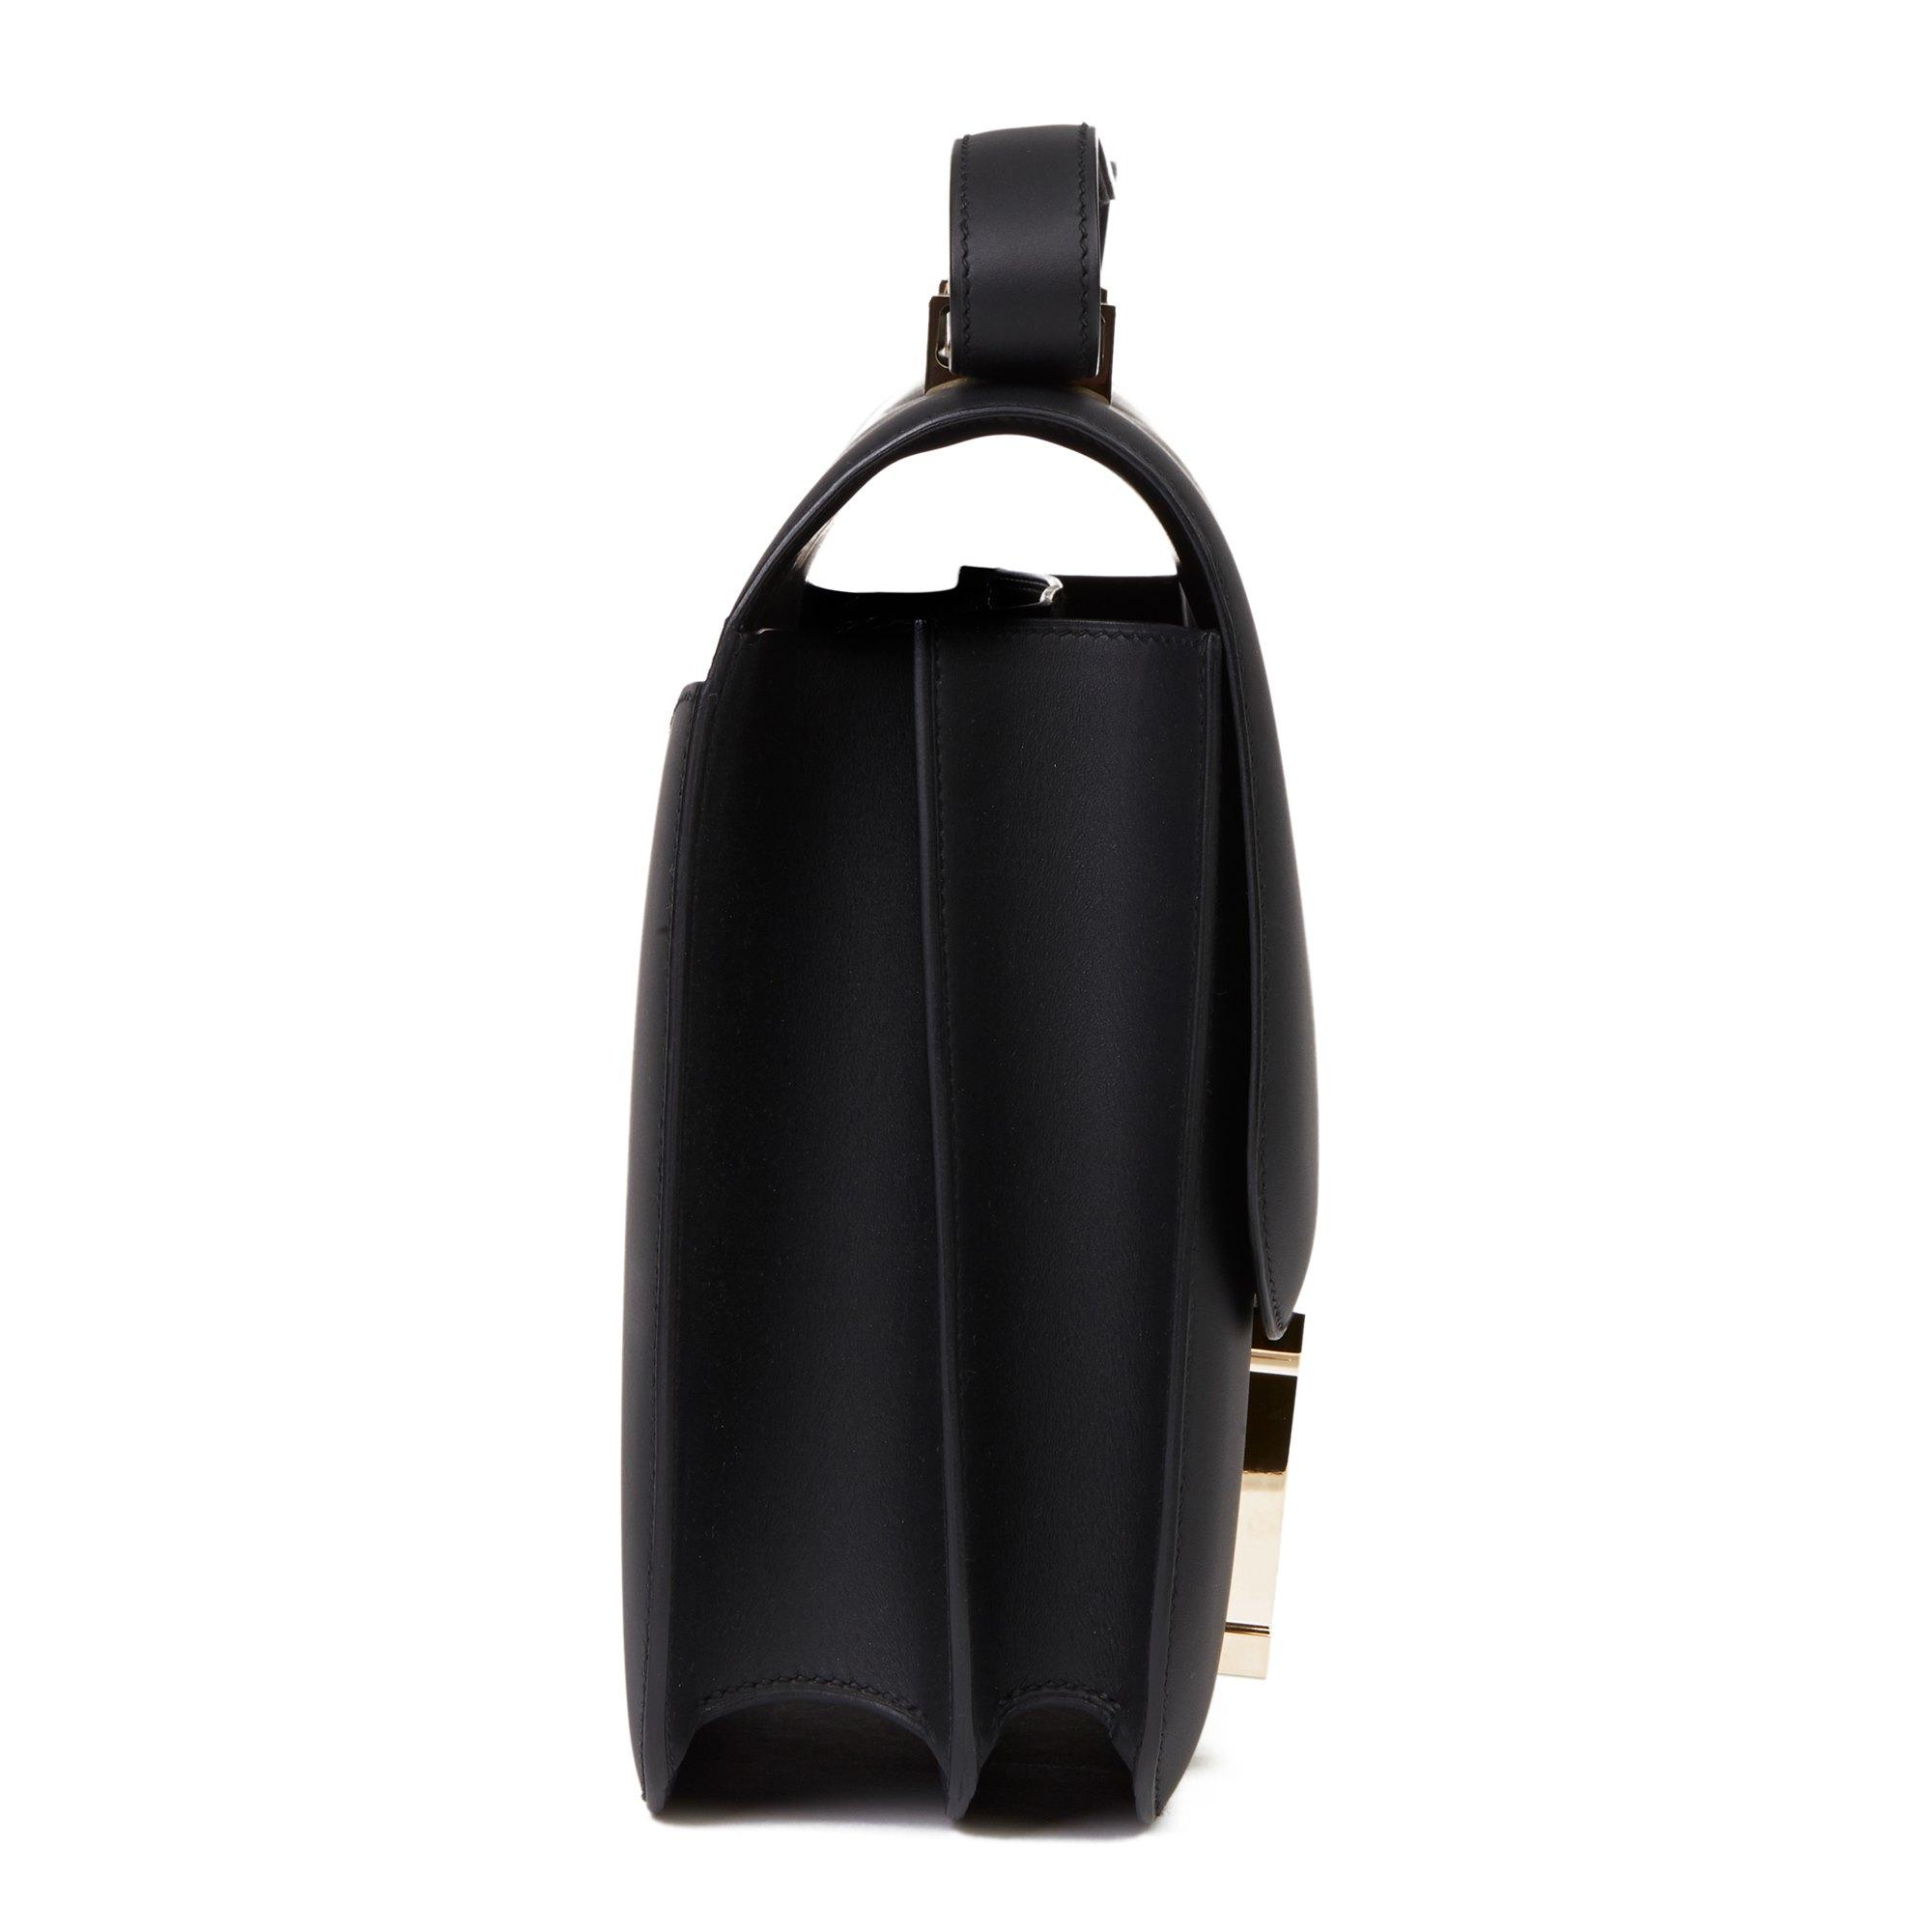 Hermès Black Sombrero Leather Constance Cartable